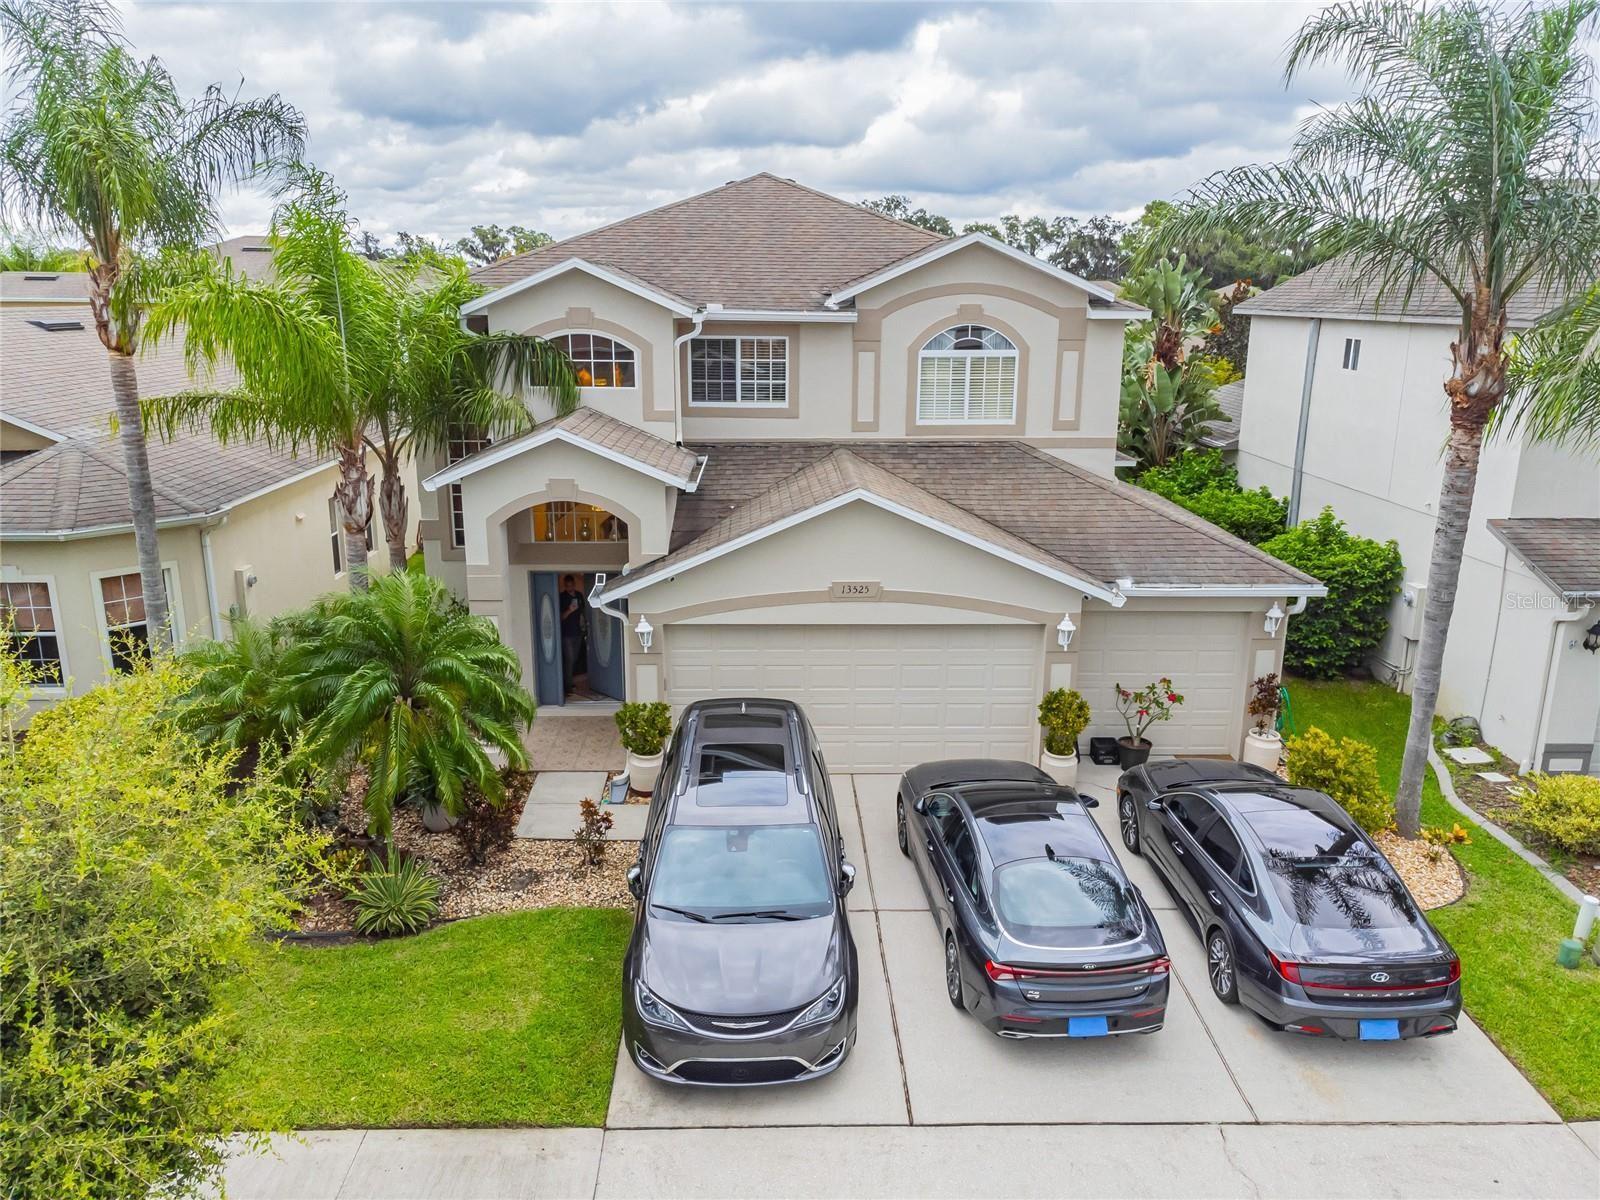 13525 TENBURY WELLS WAY, Winter Garden, FL 34787 - #: O5964081